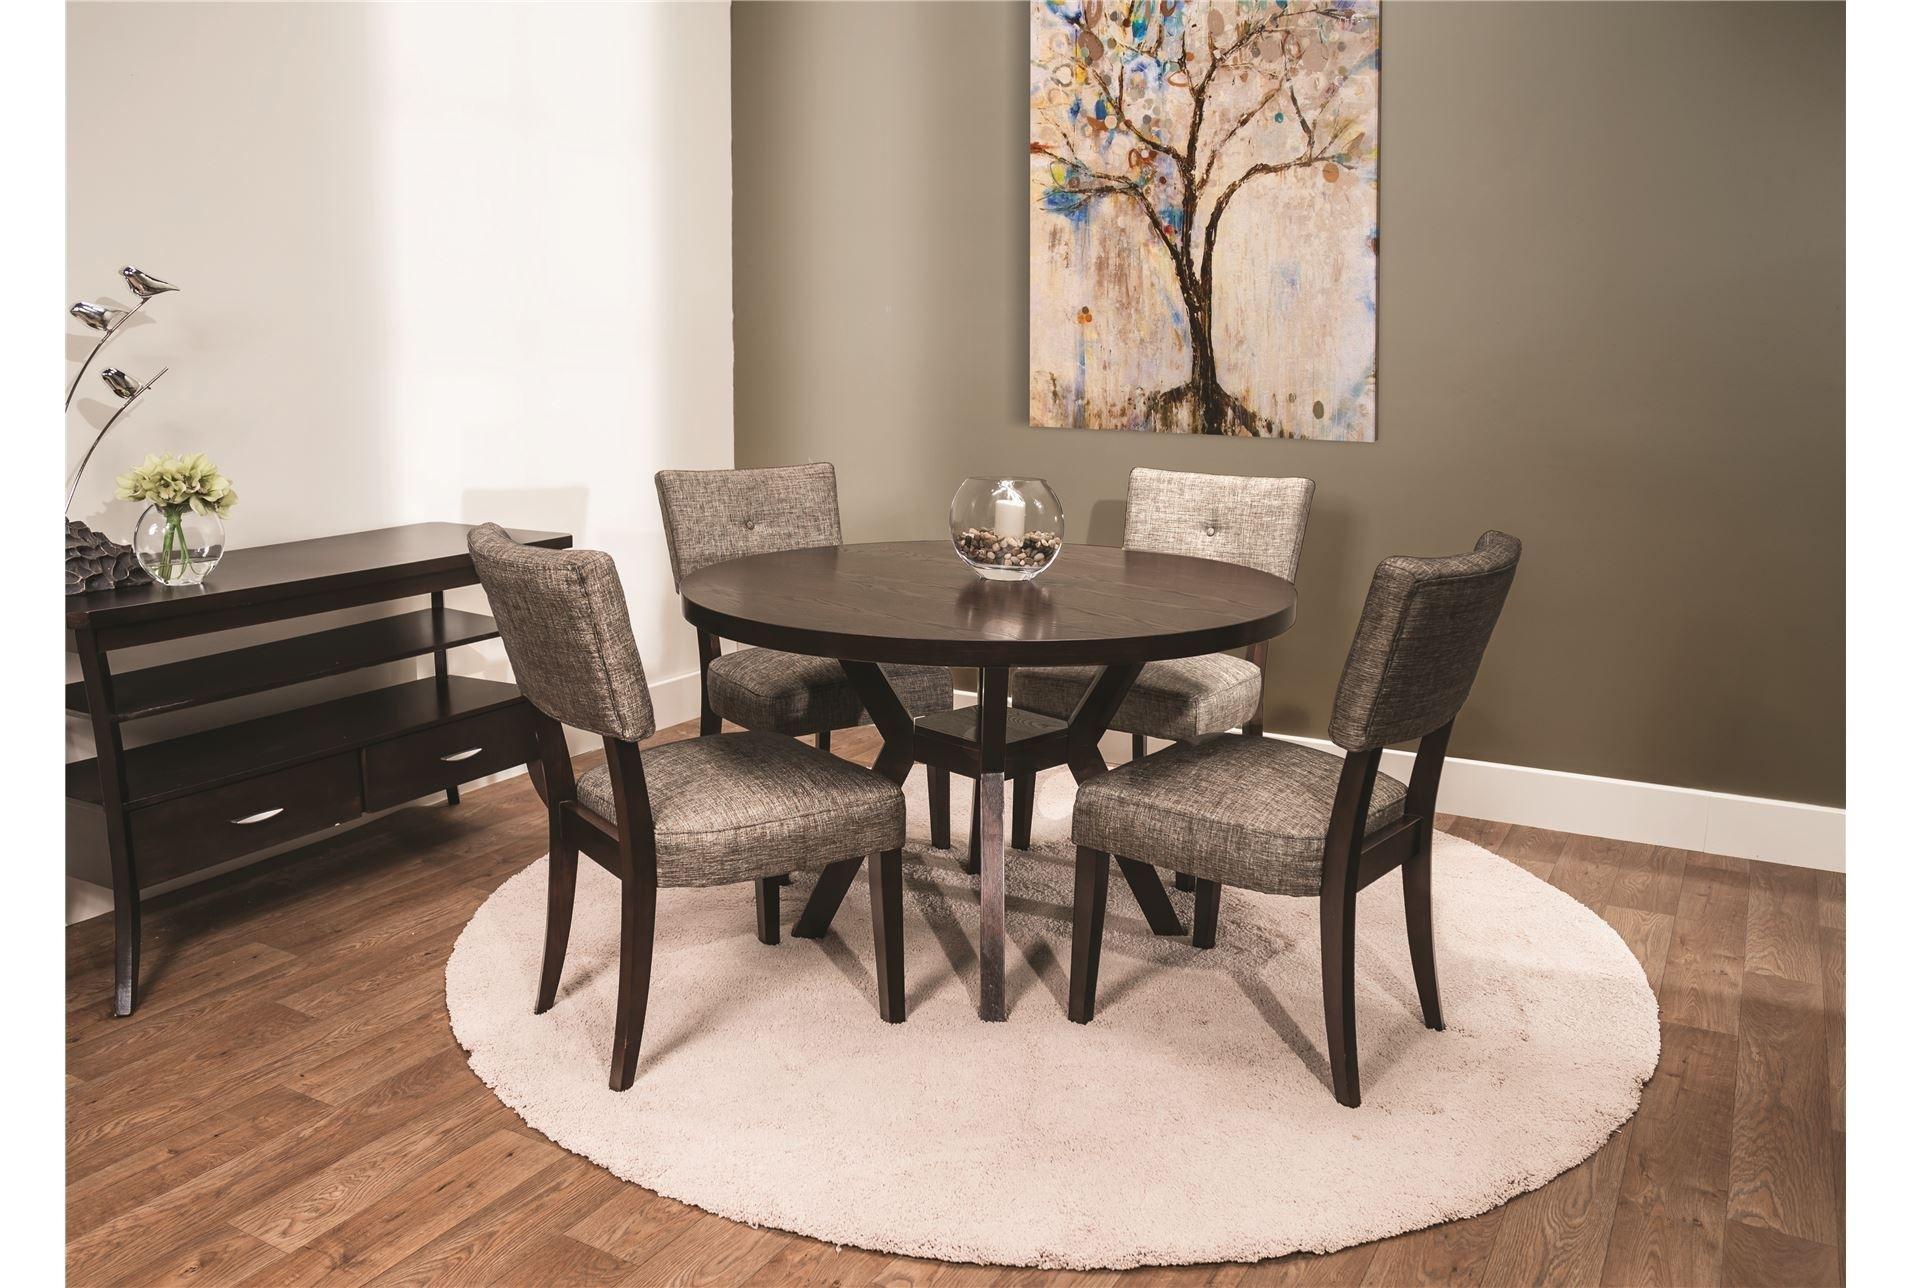 Macie Round 5 Piece Dining | Taj Style | Pinterest | Dining And House Pertaining To Latest Macie Round Dining Tables (Image 13 of 20)